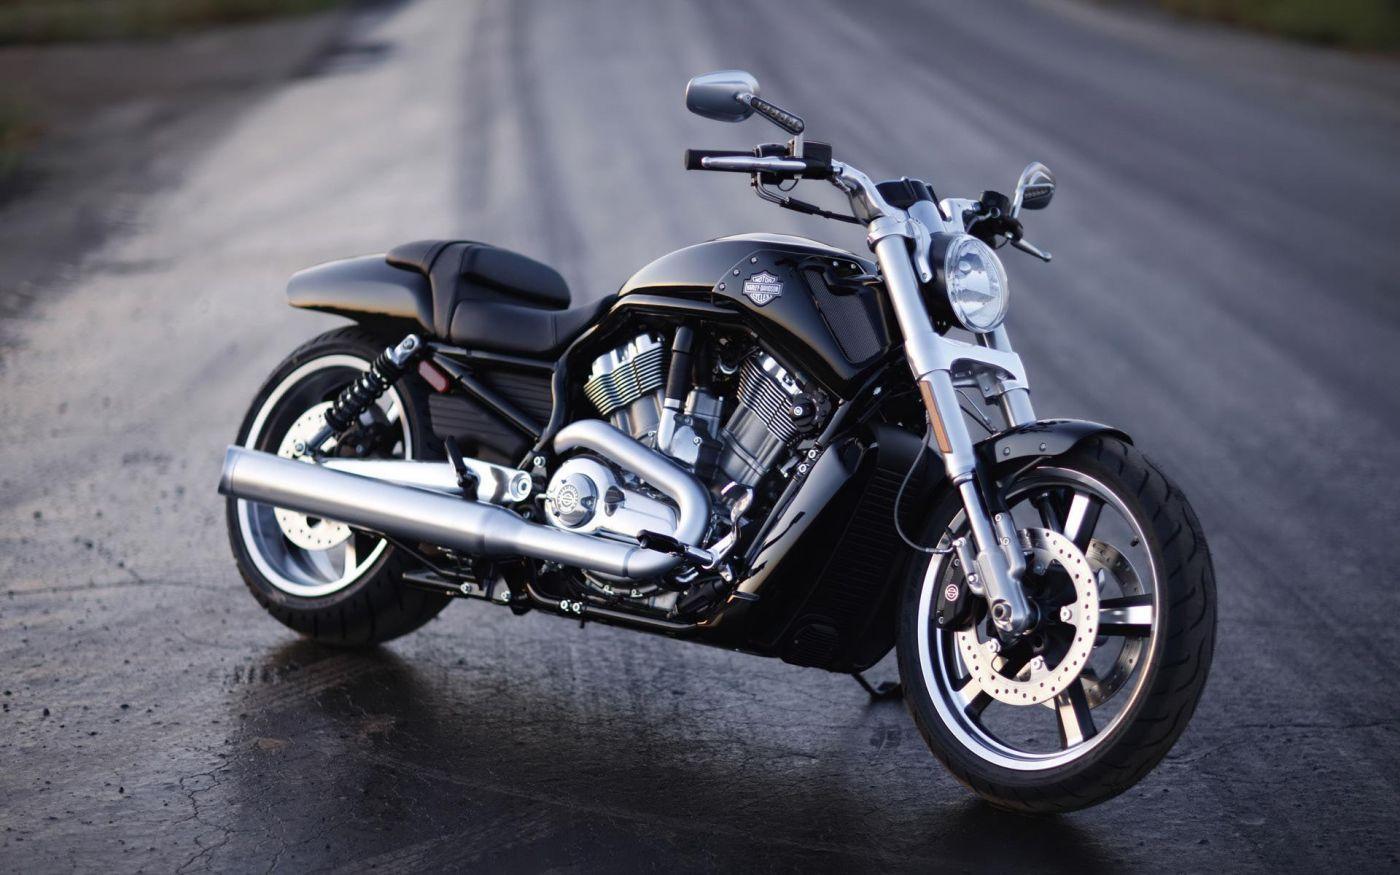 concessionnaire harley davidson avignon moto scooter motos d 39 occasion. Black Bedroom Furniture Sets. Home Design Ideas